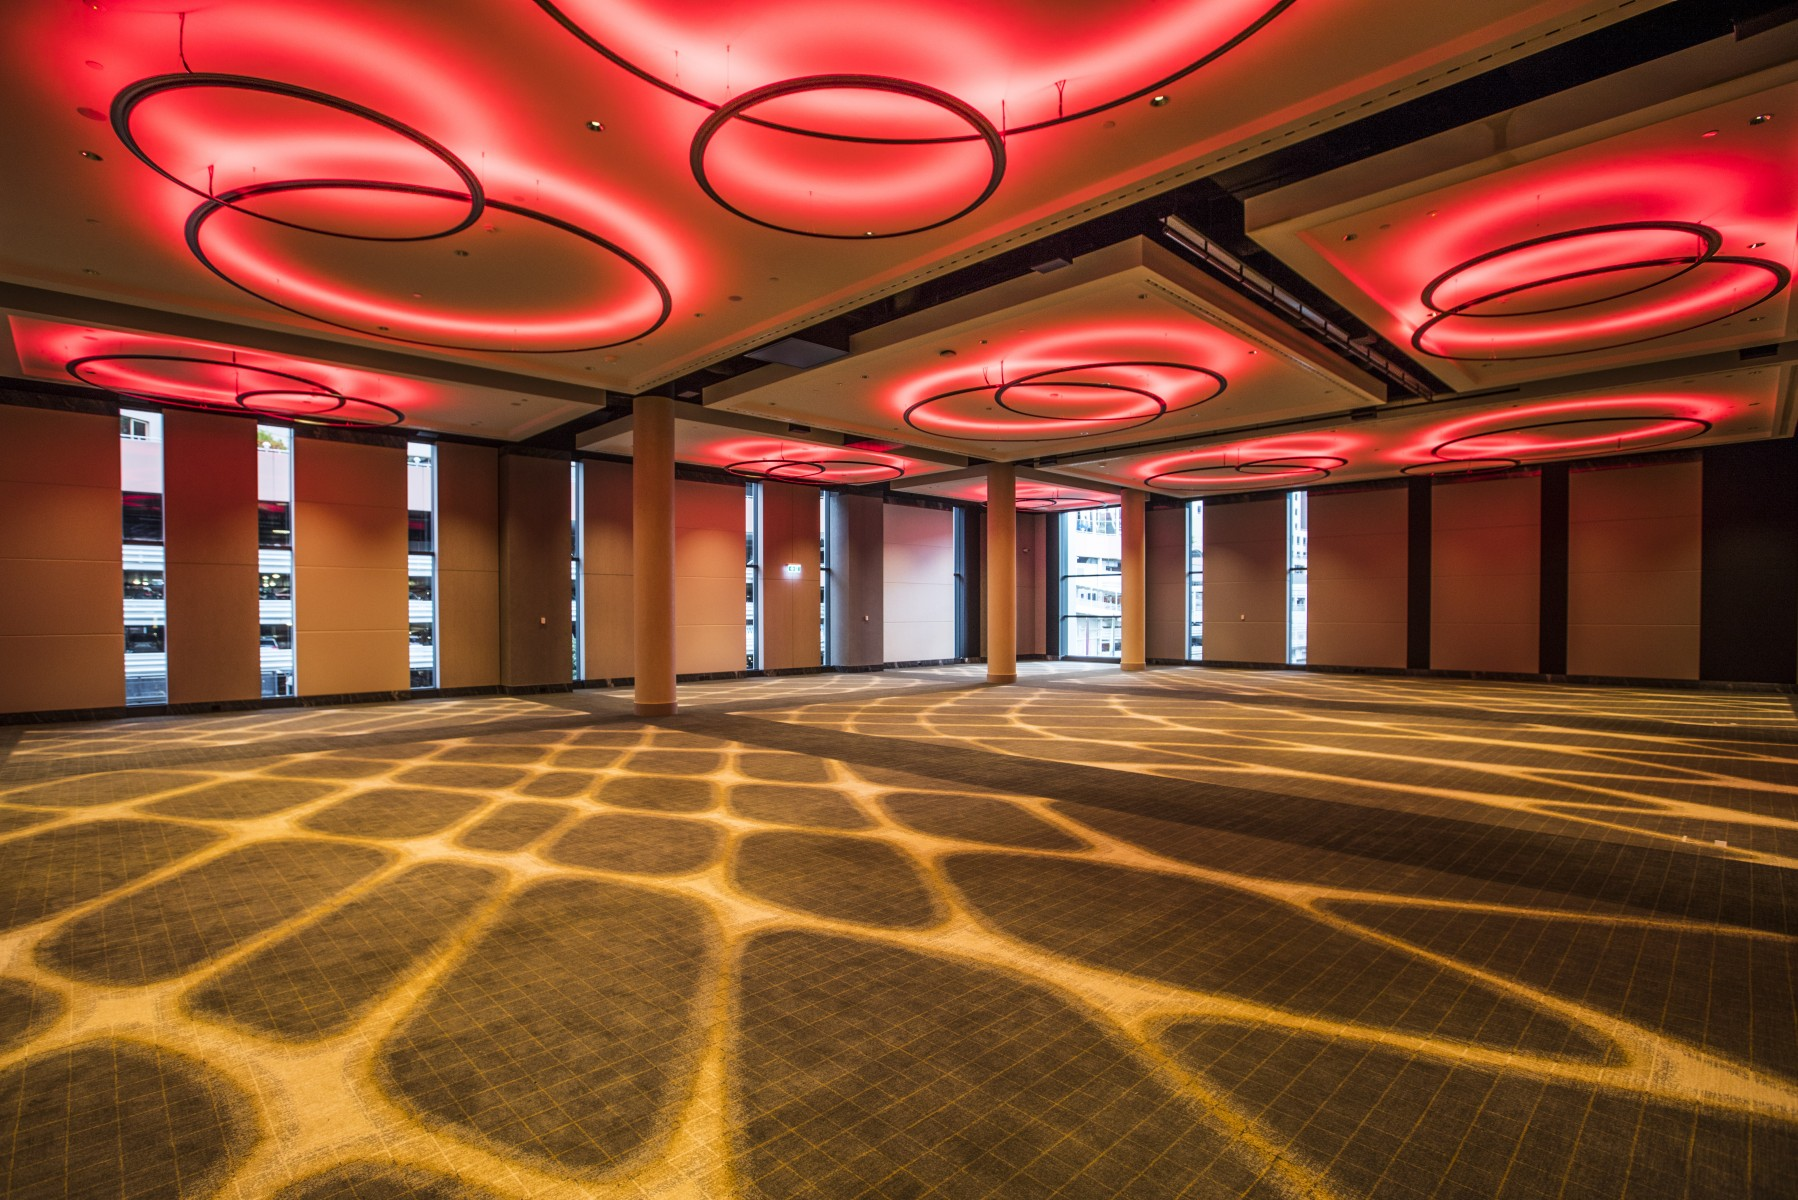 Sofitel-Sydney-Darling-Harbour-Ballroom-6.jpg